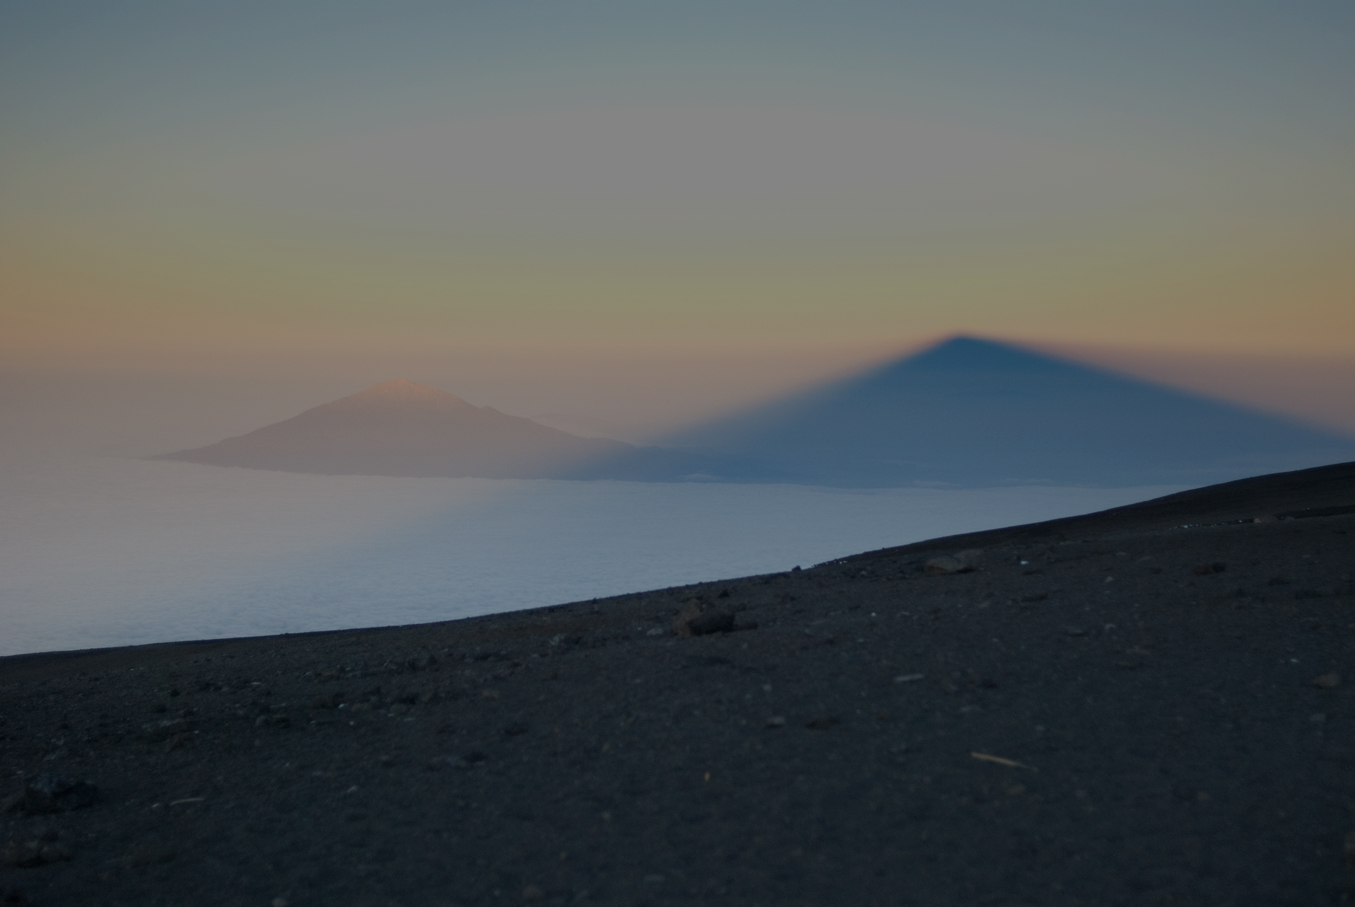 The shade of Mt. Kilimanjaro over Mt. Meru, Tanzania